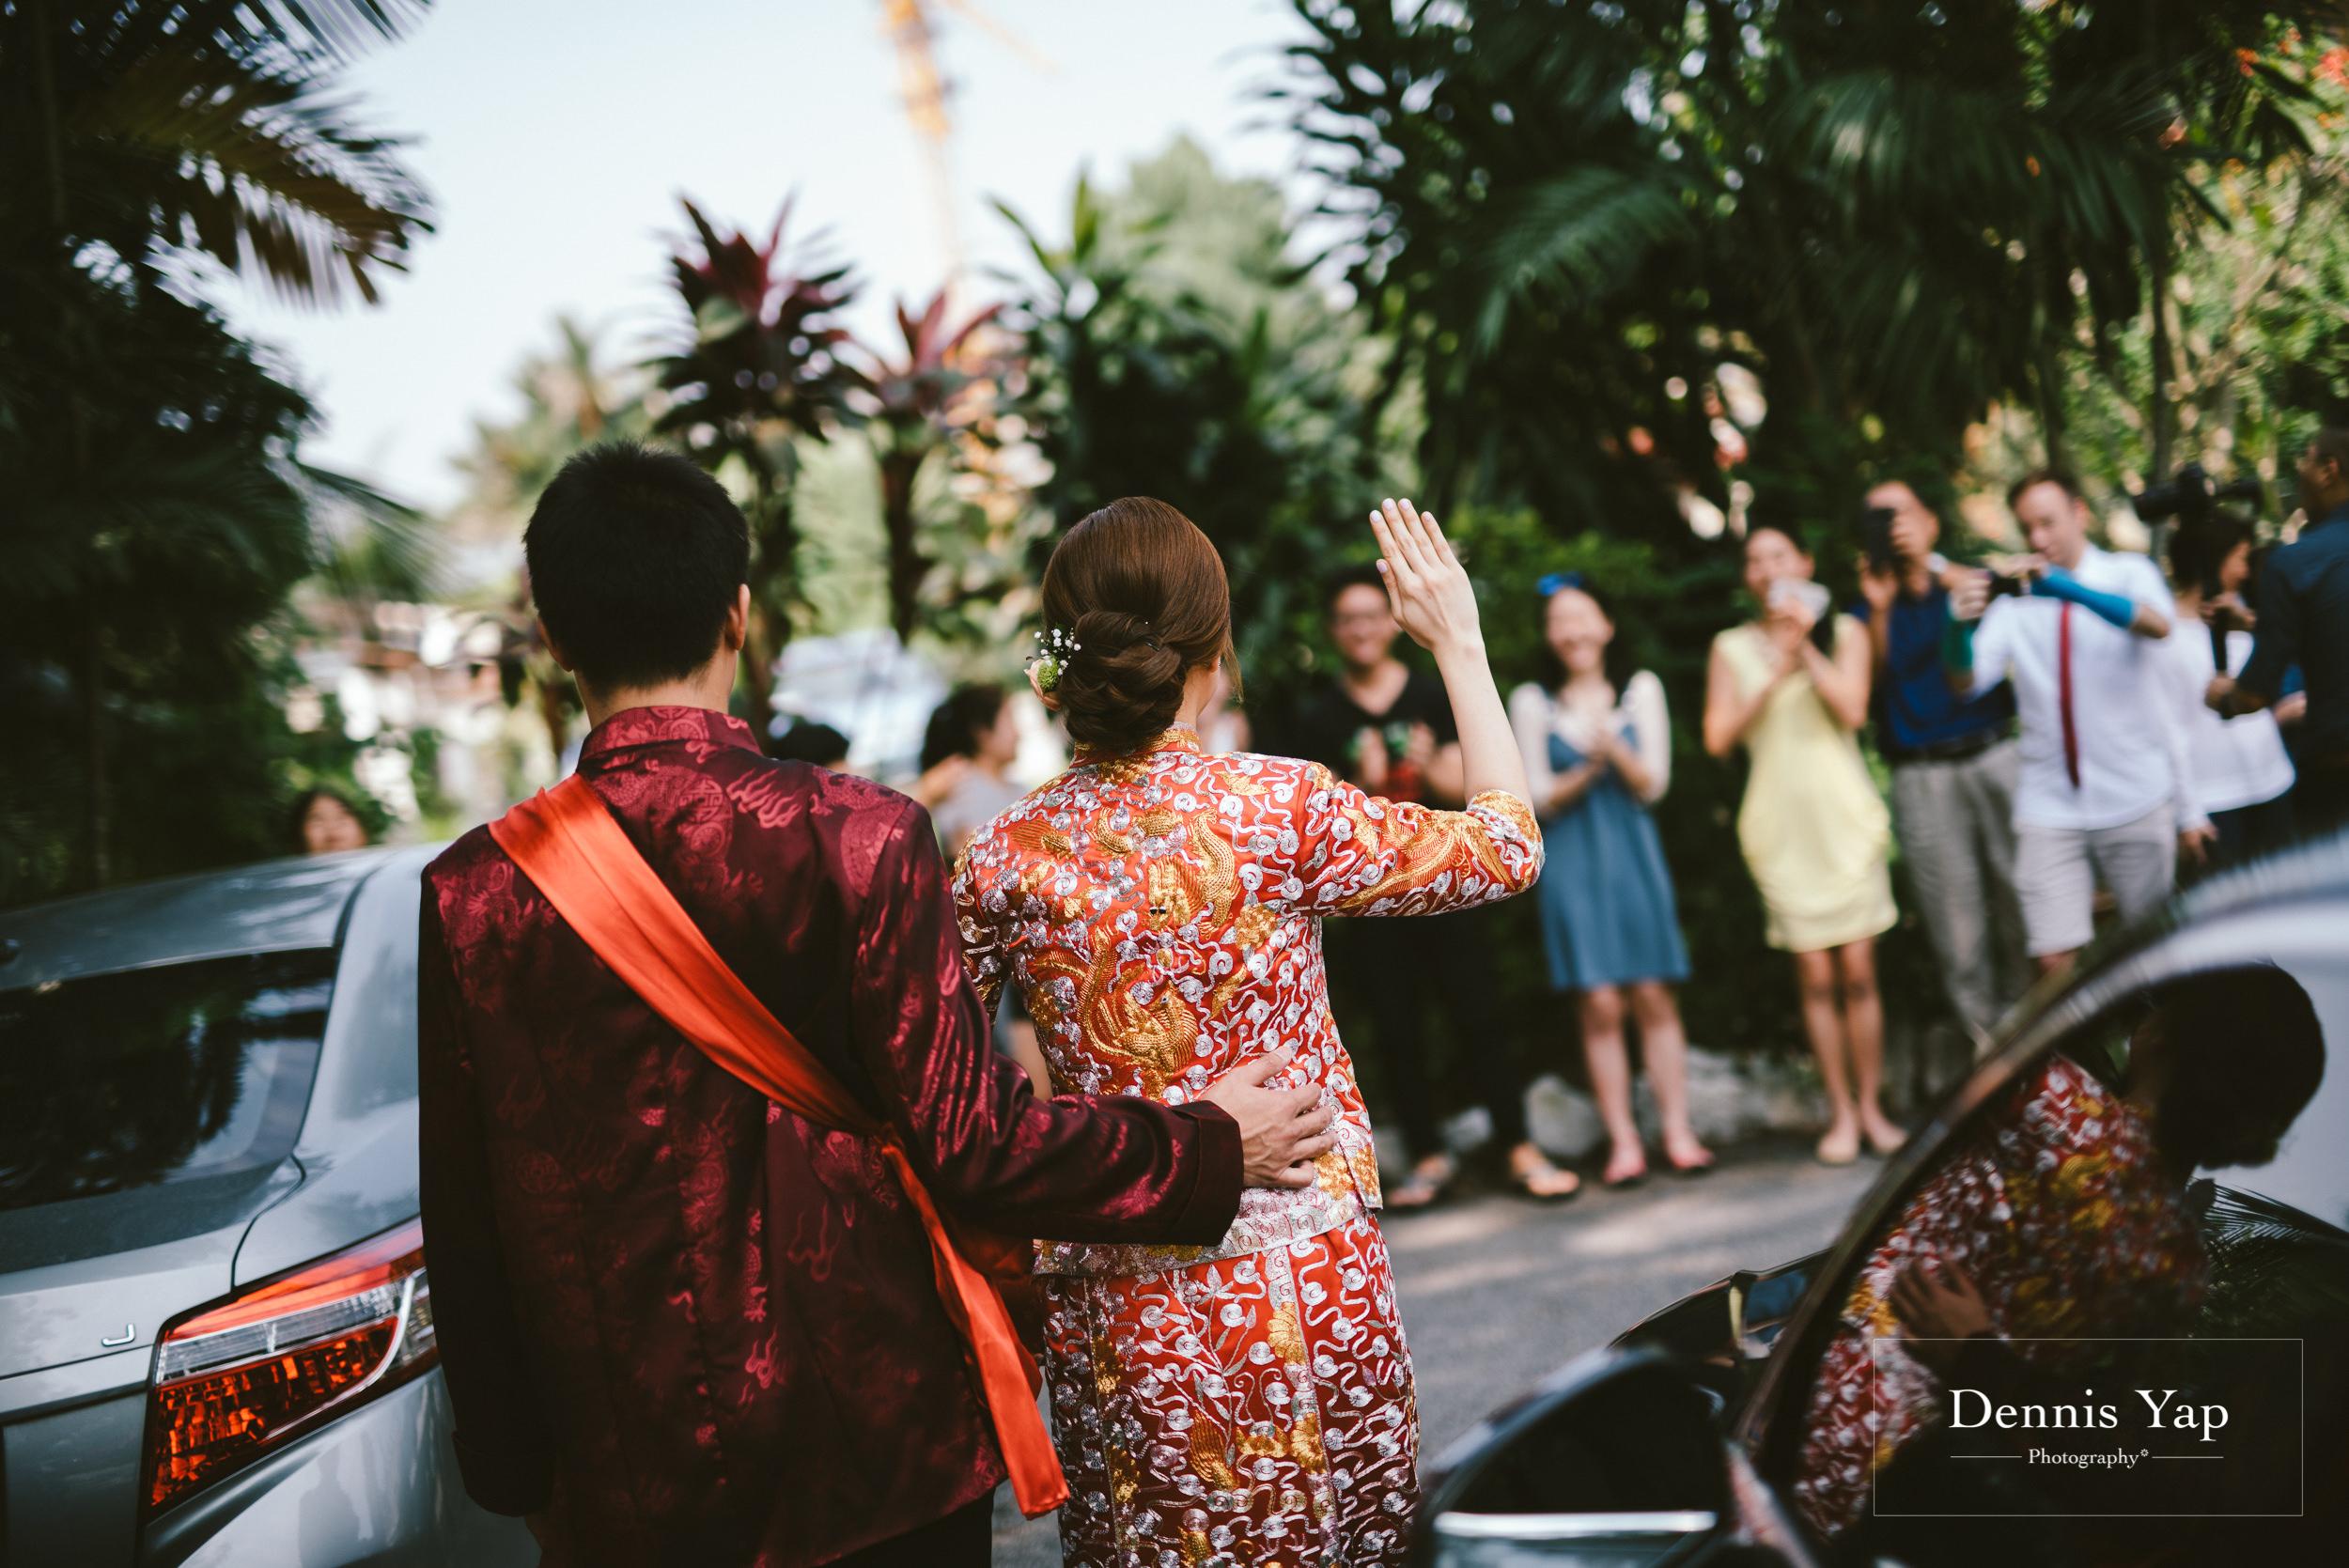 justin hsin wedding day ciao ristorante kuala lumpur dennis yap photography-19.jpg